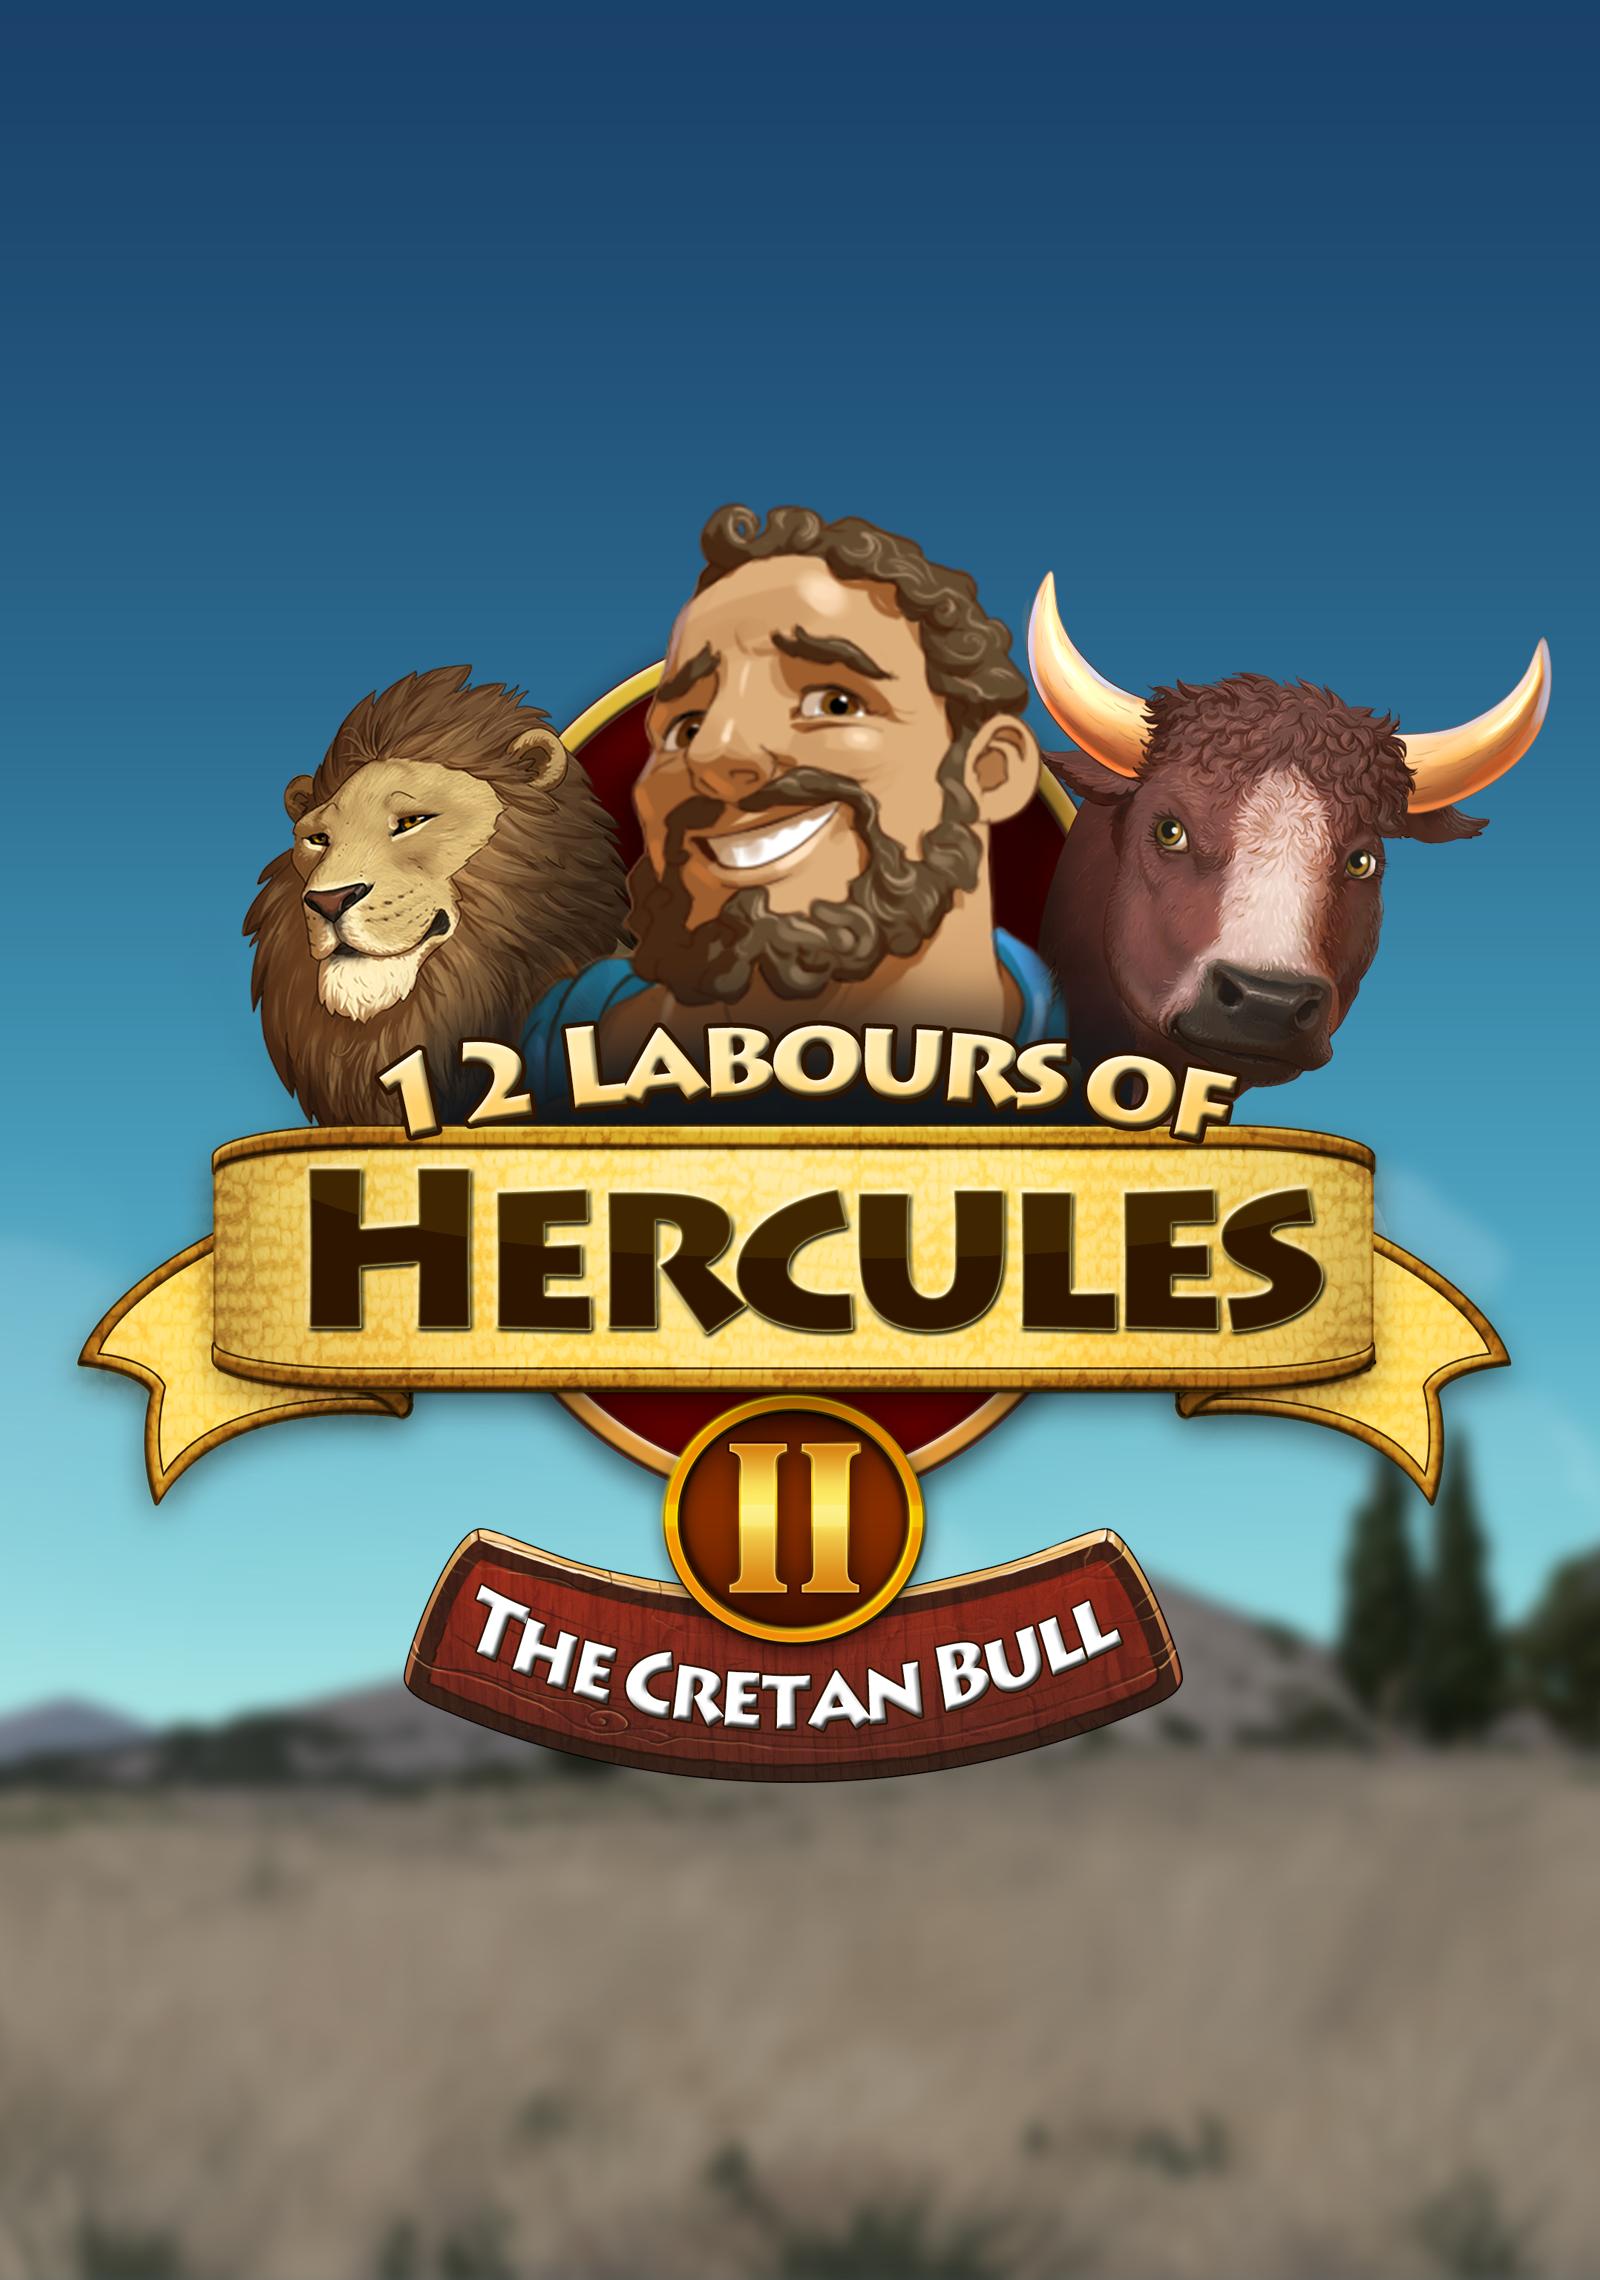 12 Labours Of Hercules Ii The Cretan Bull Online Game